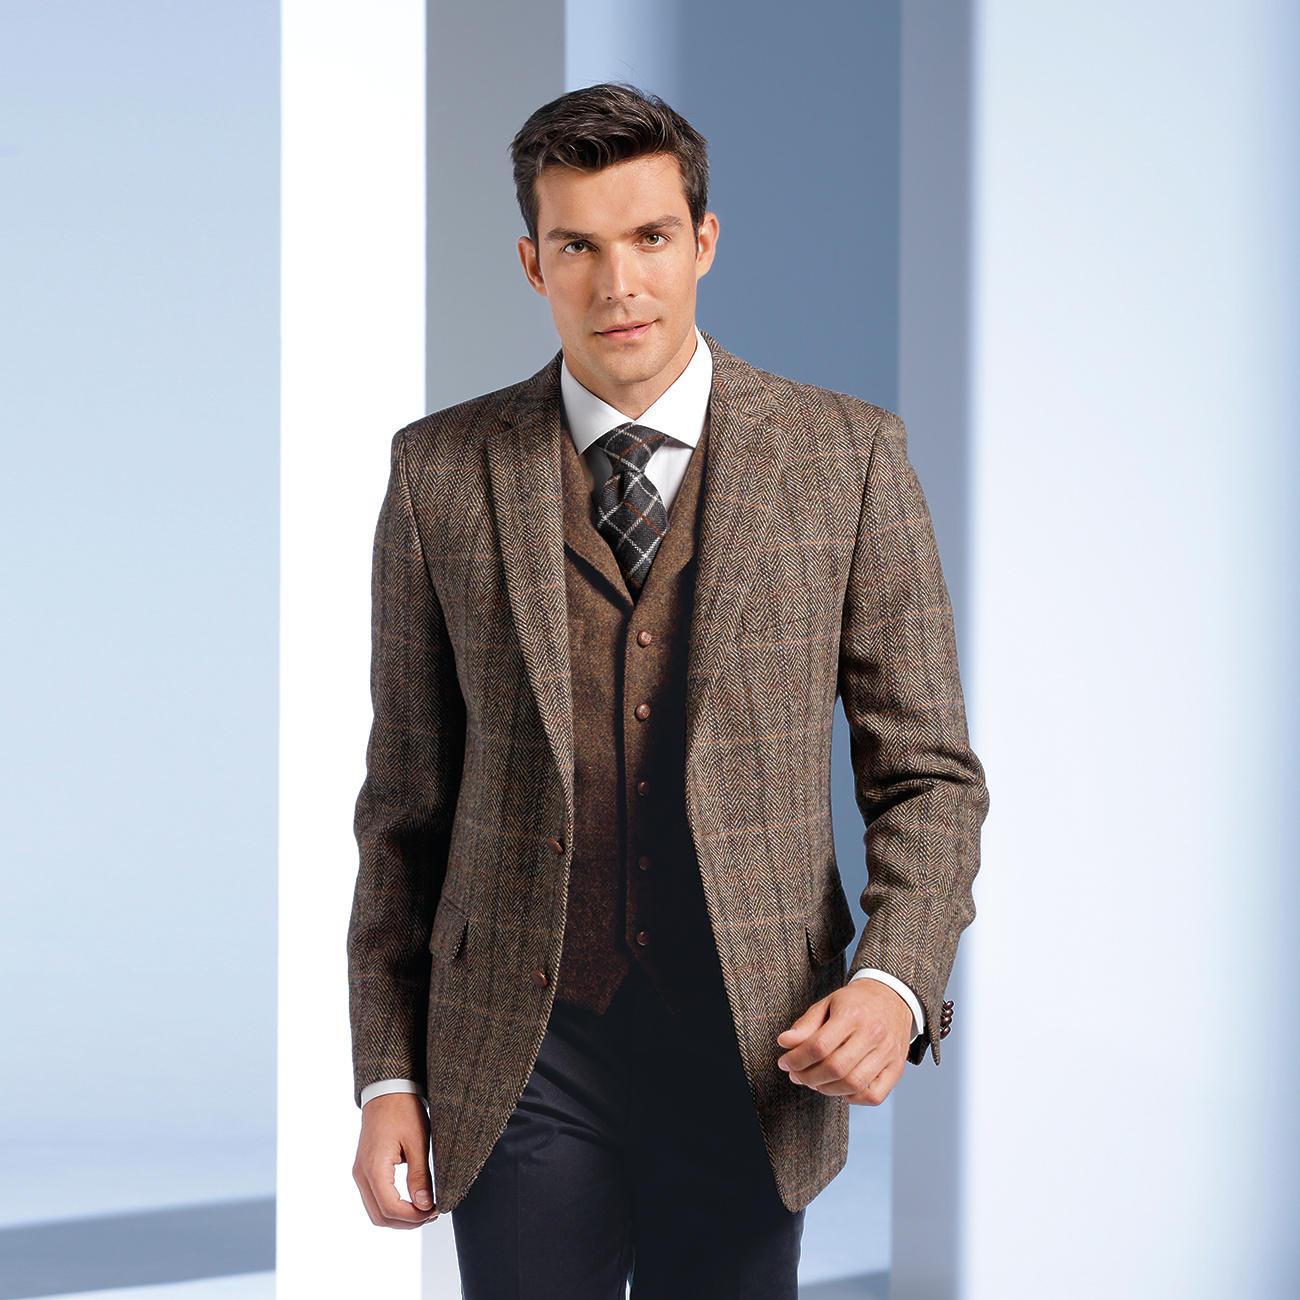 La Grande Homme Tweed J'ai Classe Veste RfYw6qx